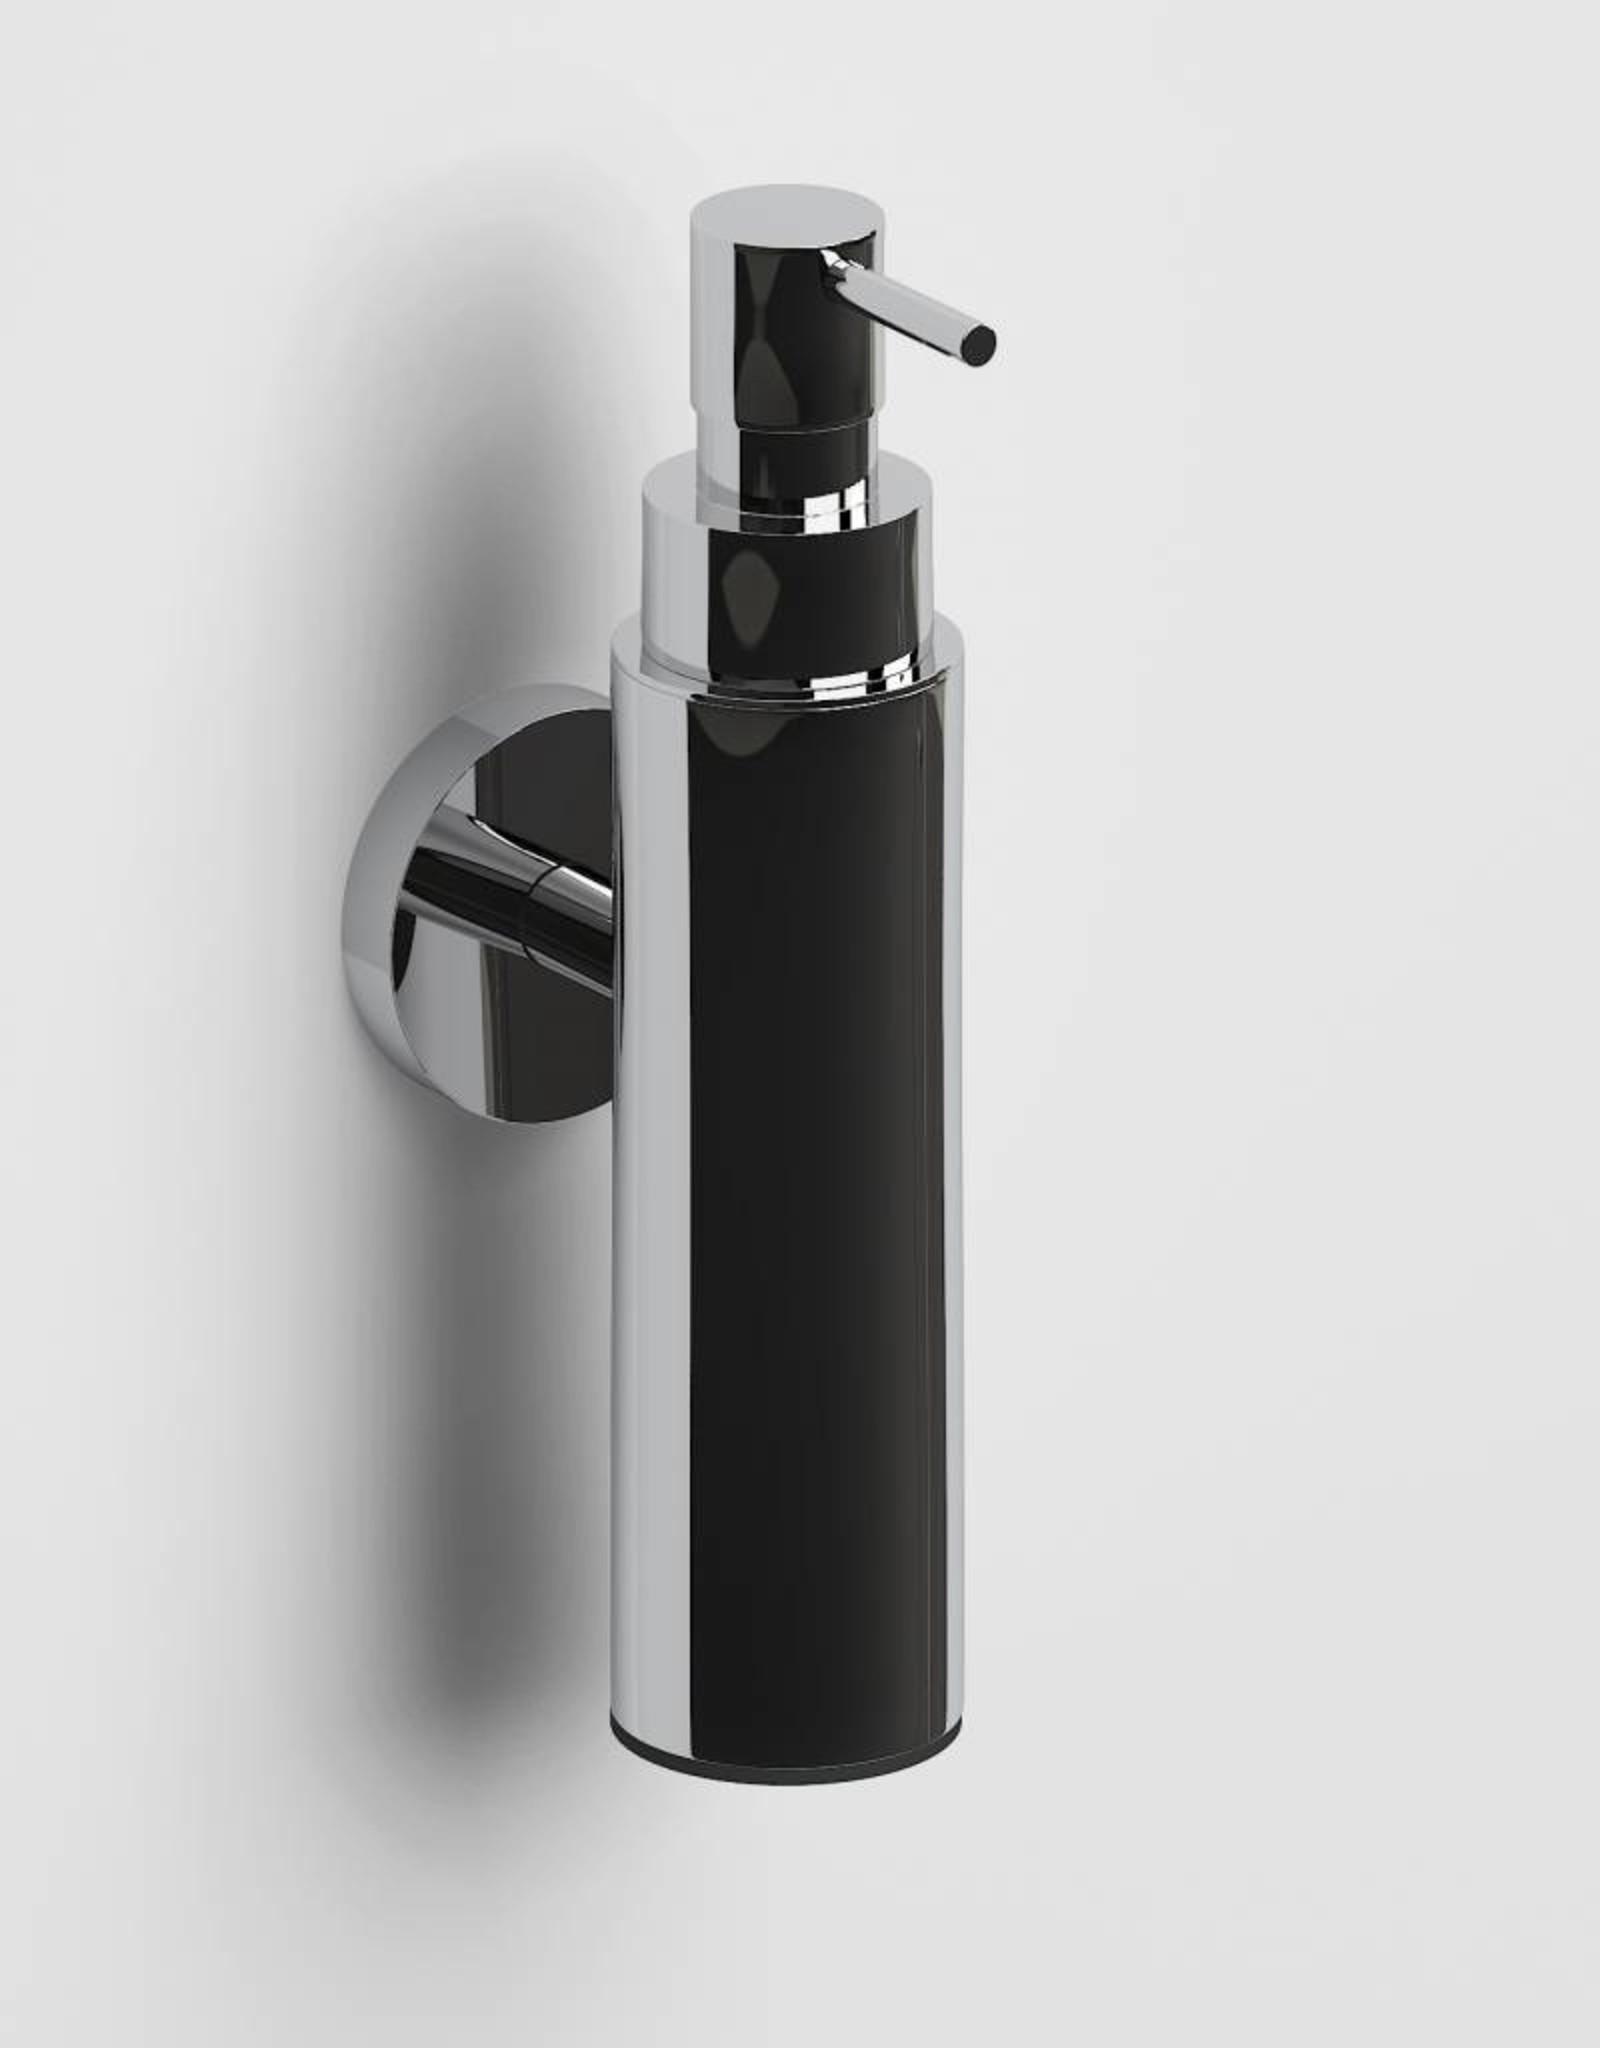 Sjokker soap dispenser 100cc, wall mounted